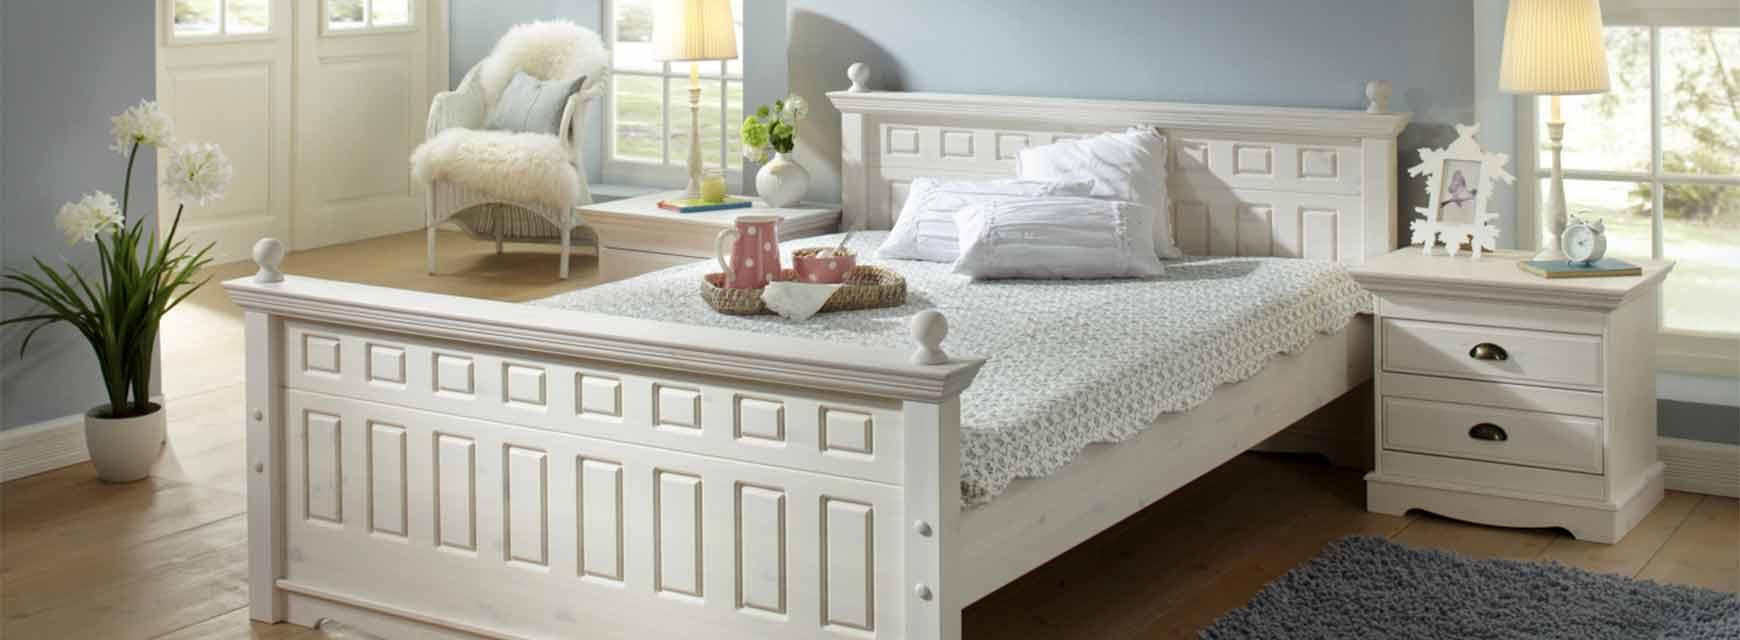 Full Size of Betten überlänge Bett Landhausstil Landhaus Online Kaufen Naturloftde Amazon 180x200 Tempur De Massivholz Ruf Fabrikverkauf Jensen Ikea 160x200 Holz Bett Betten überlänge